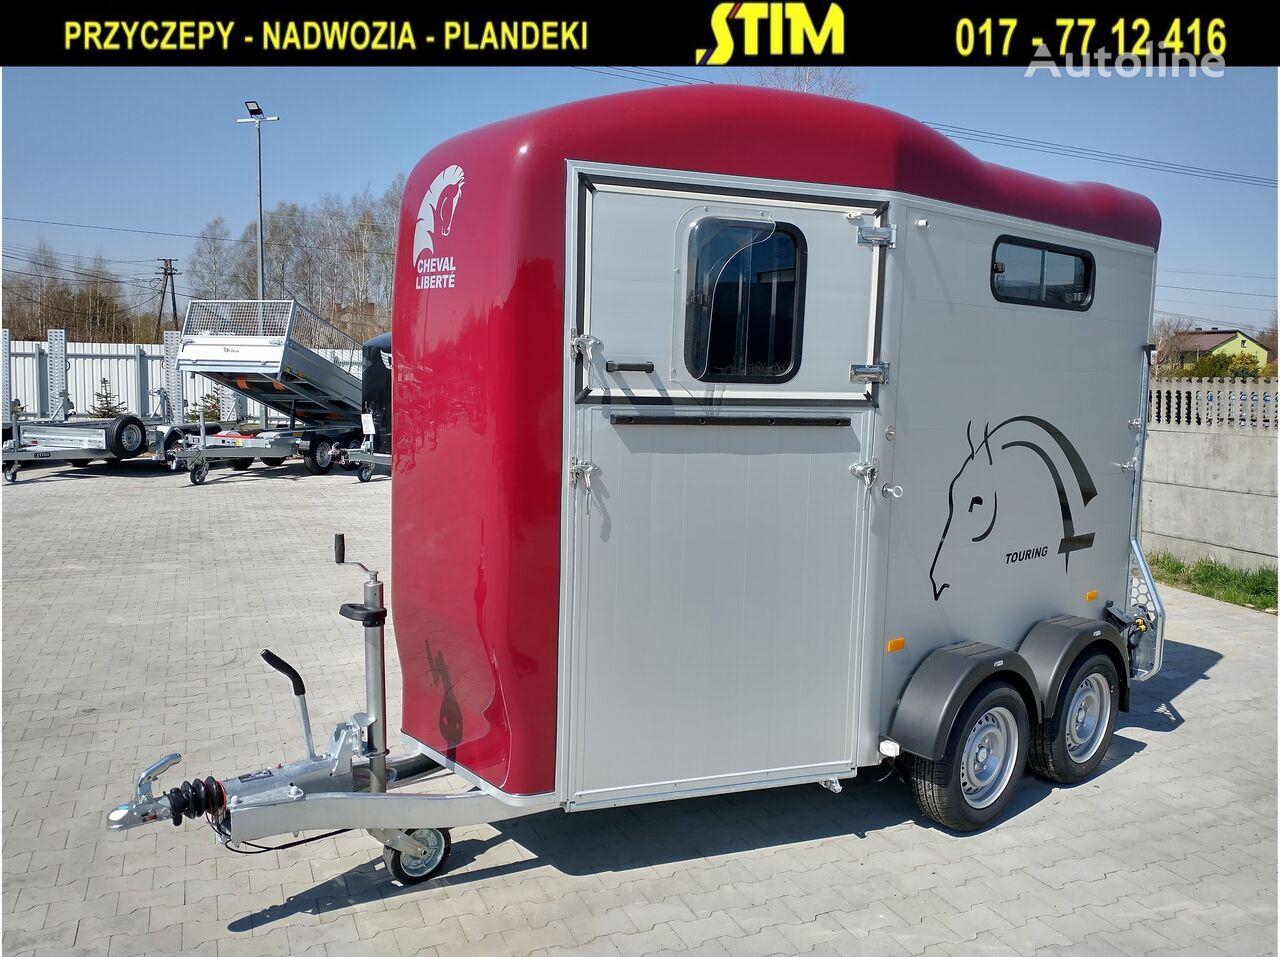 new Cheval liberte VDK20, Liberte Touring Country horse trailer